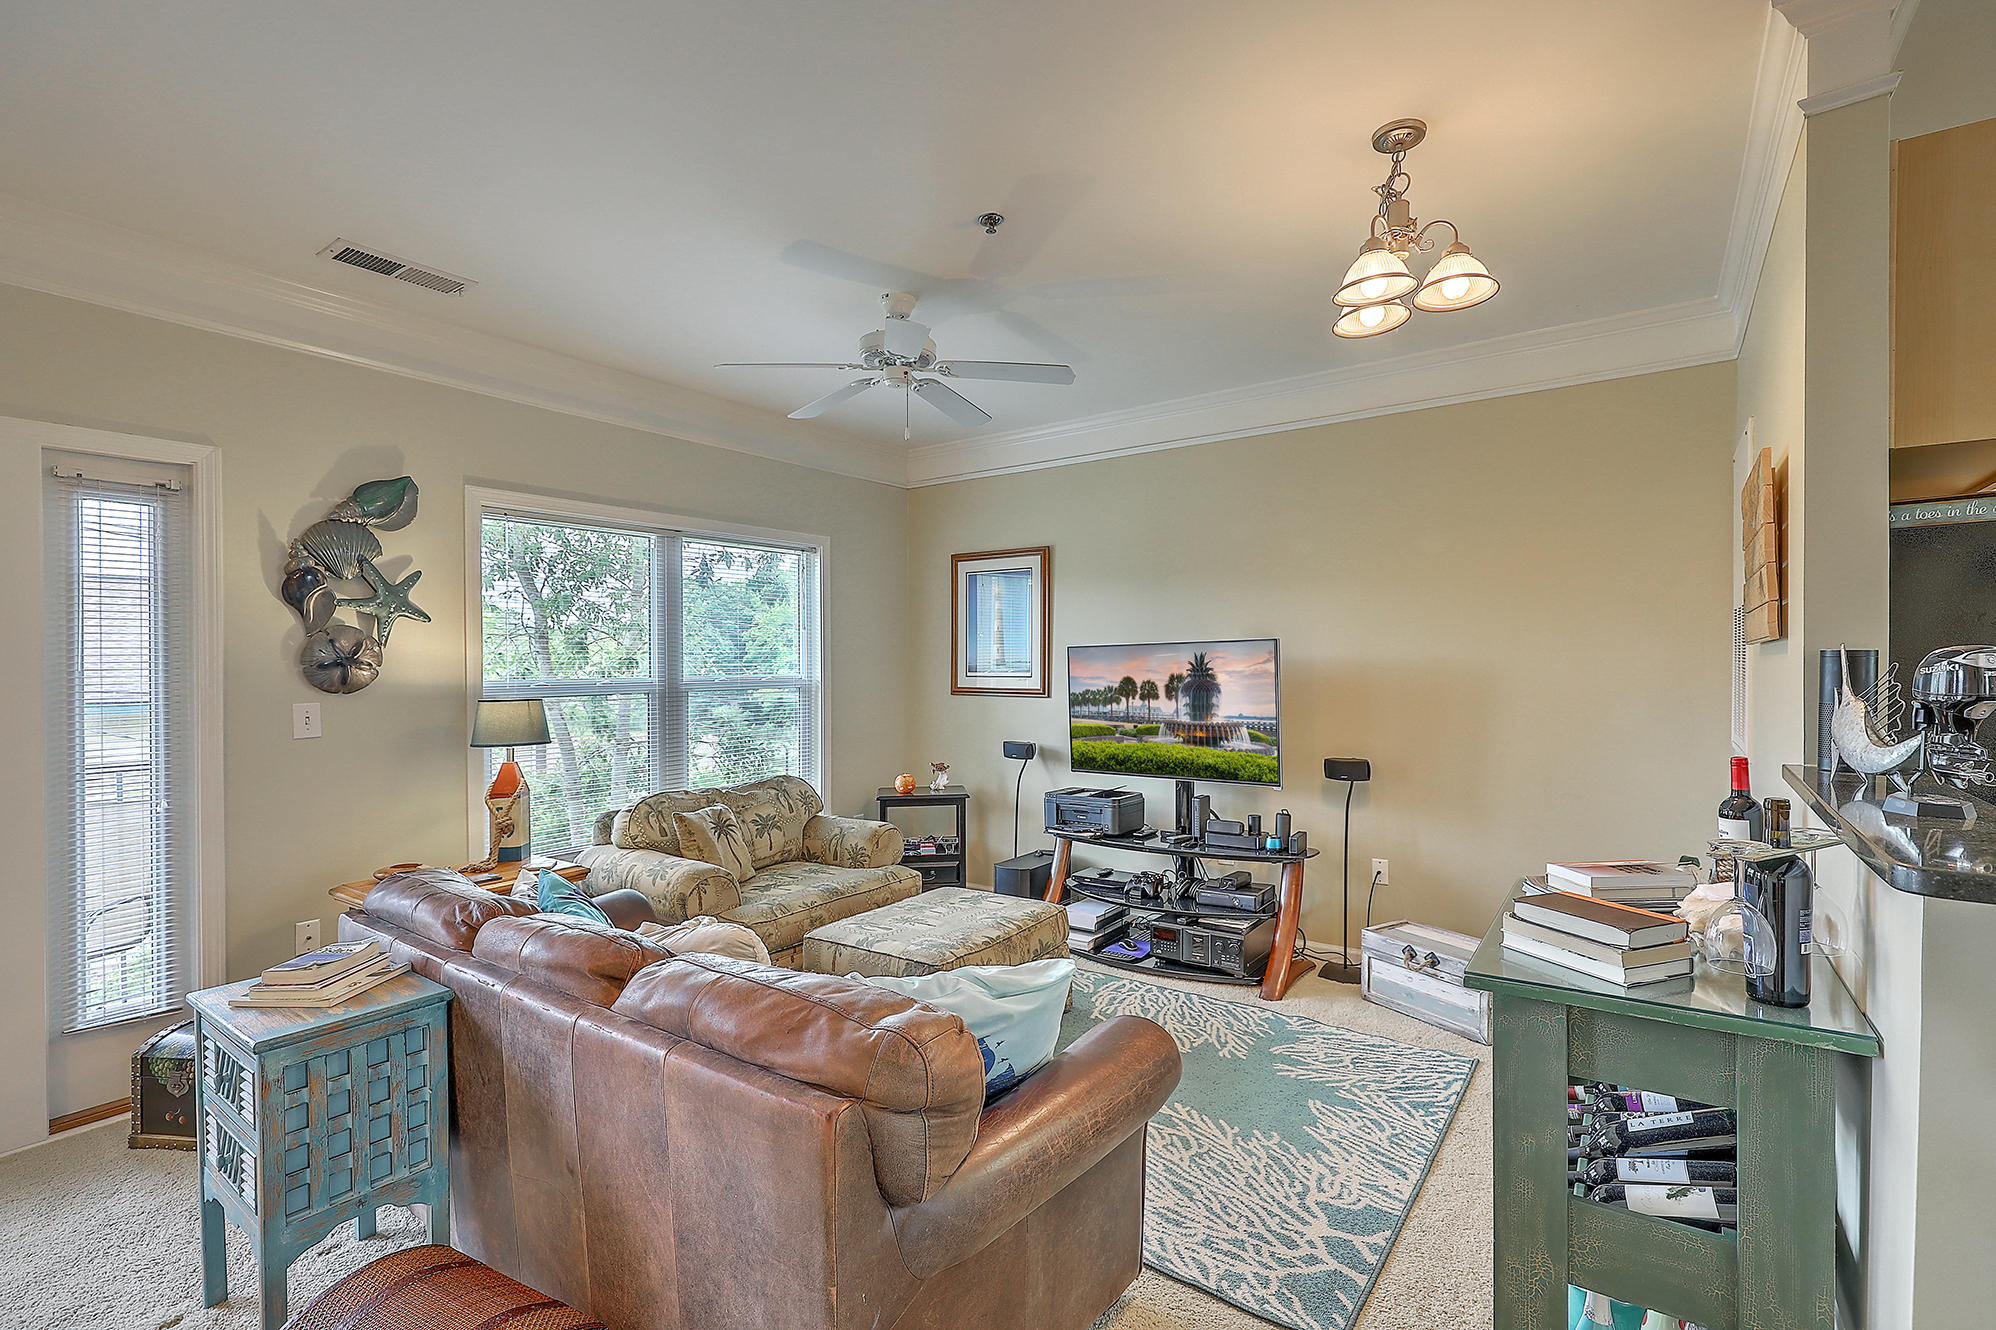 Regatta On James Island Homes For Sale - 1755 Central Park, James Island, SC - 4